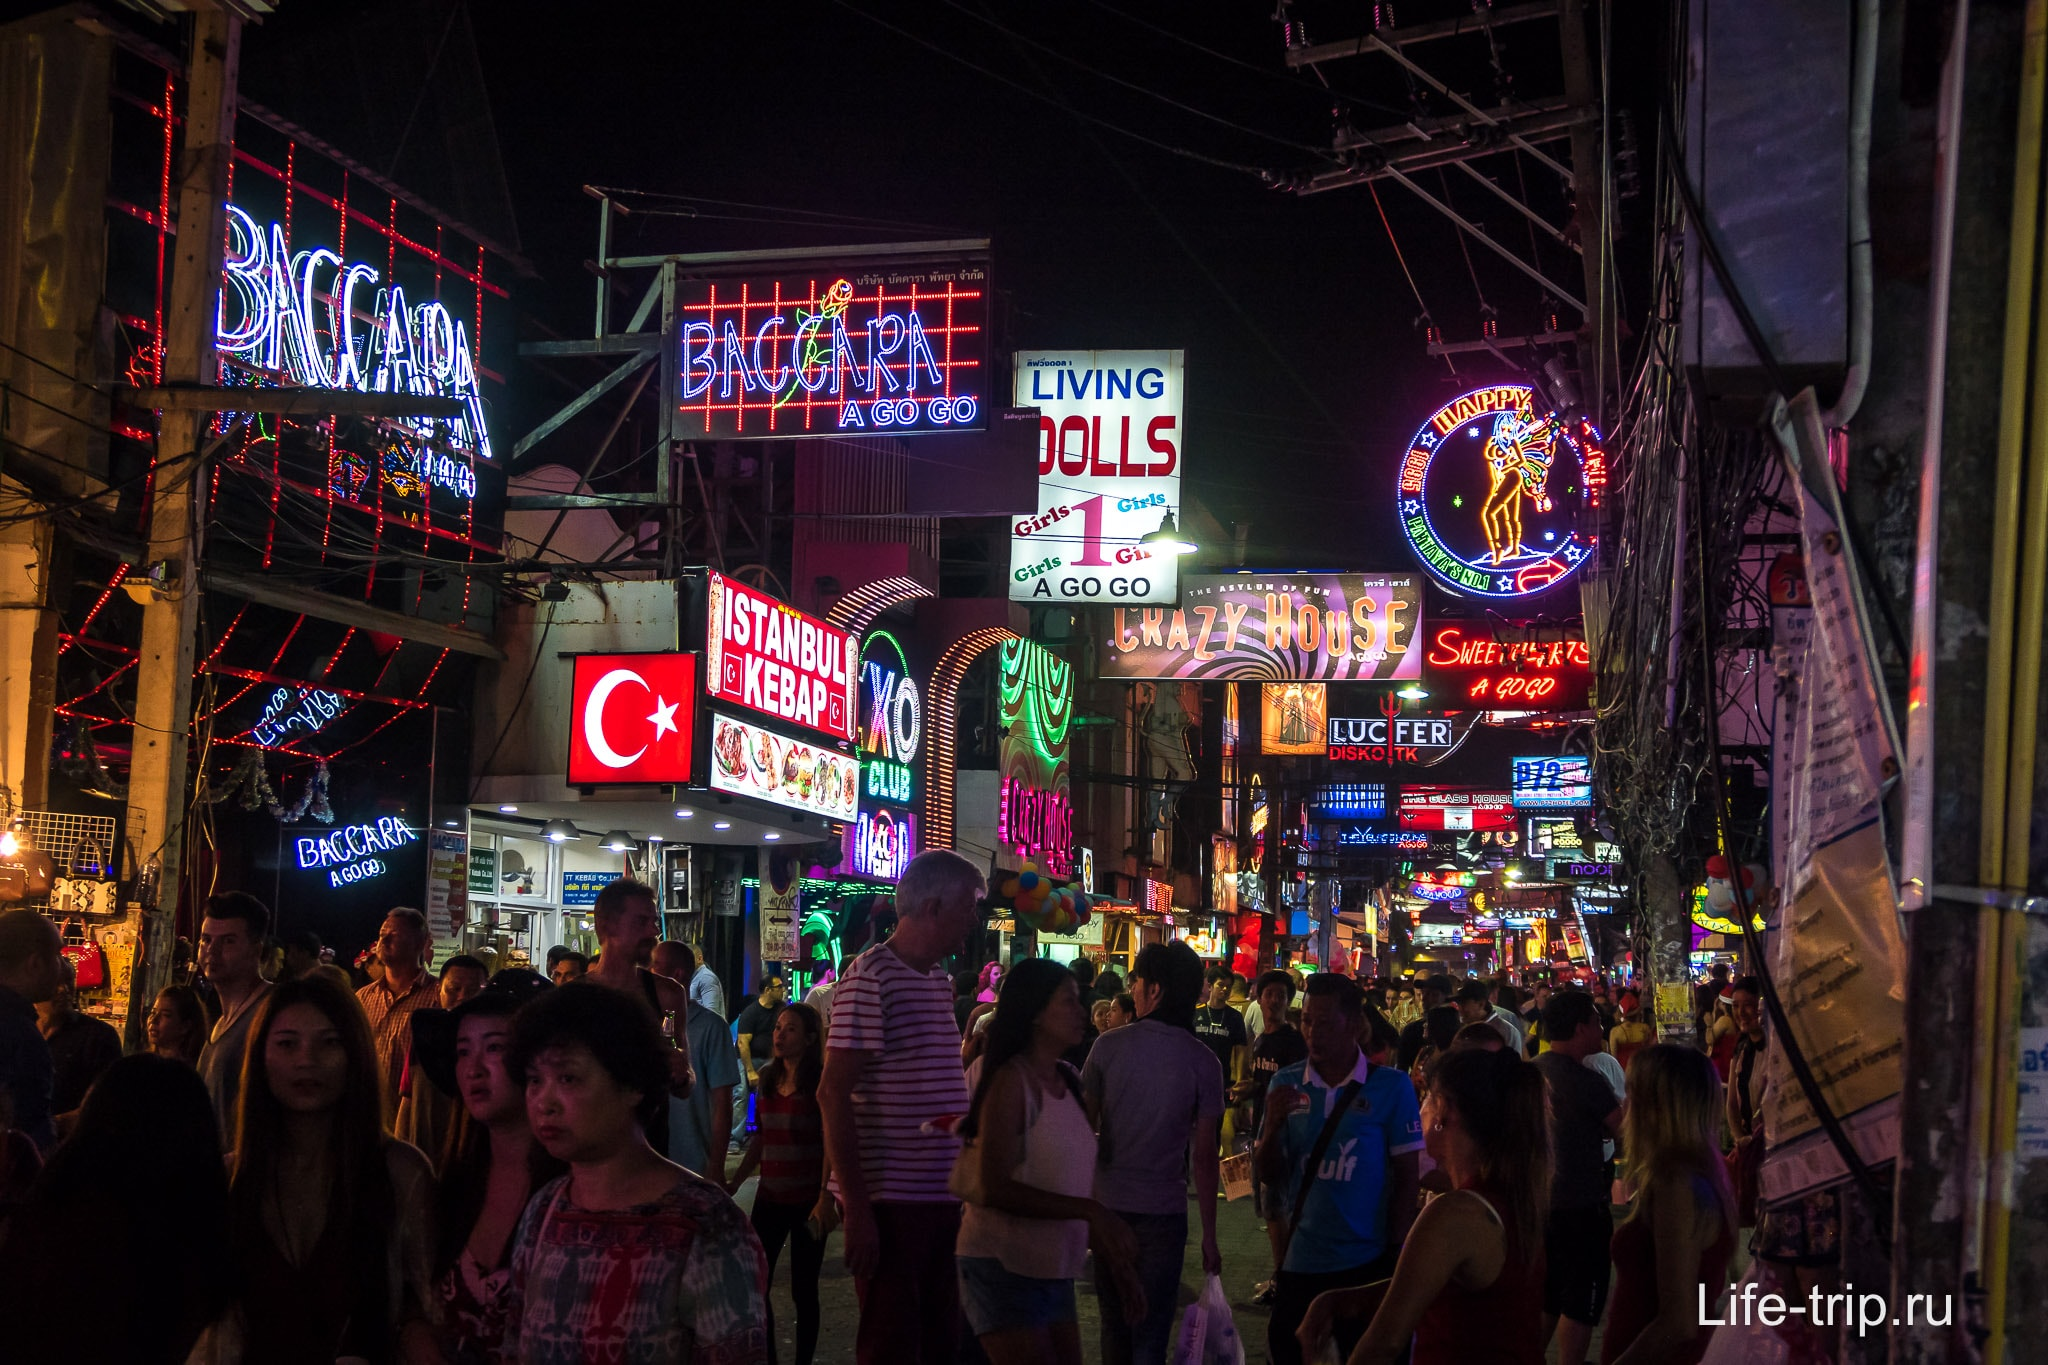 таиланд паттайя волкин стрит фото означает, что